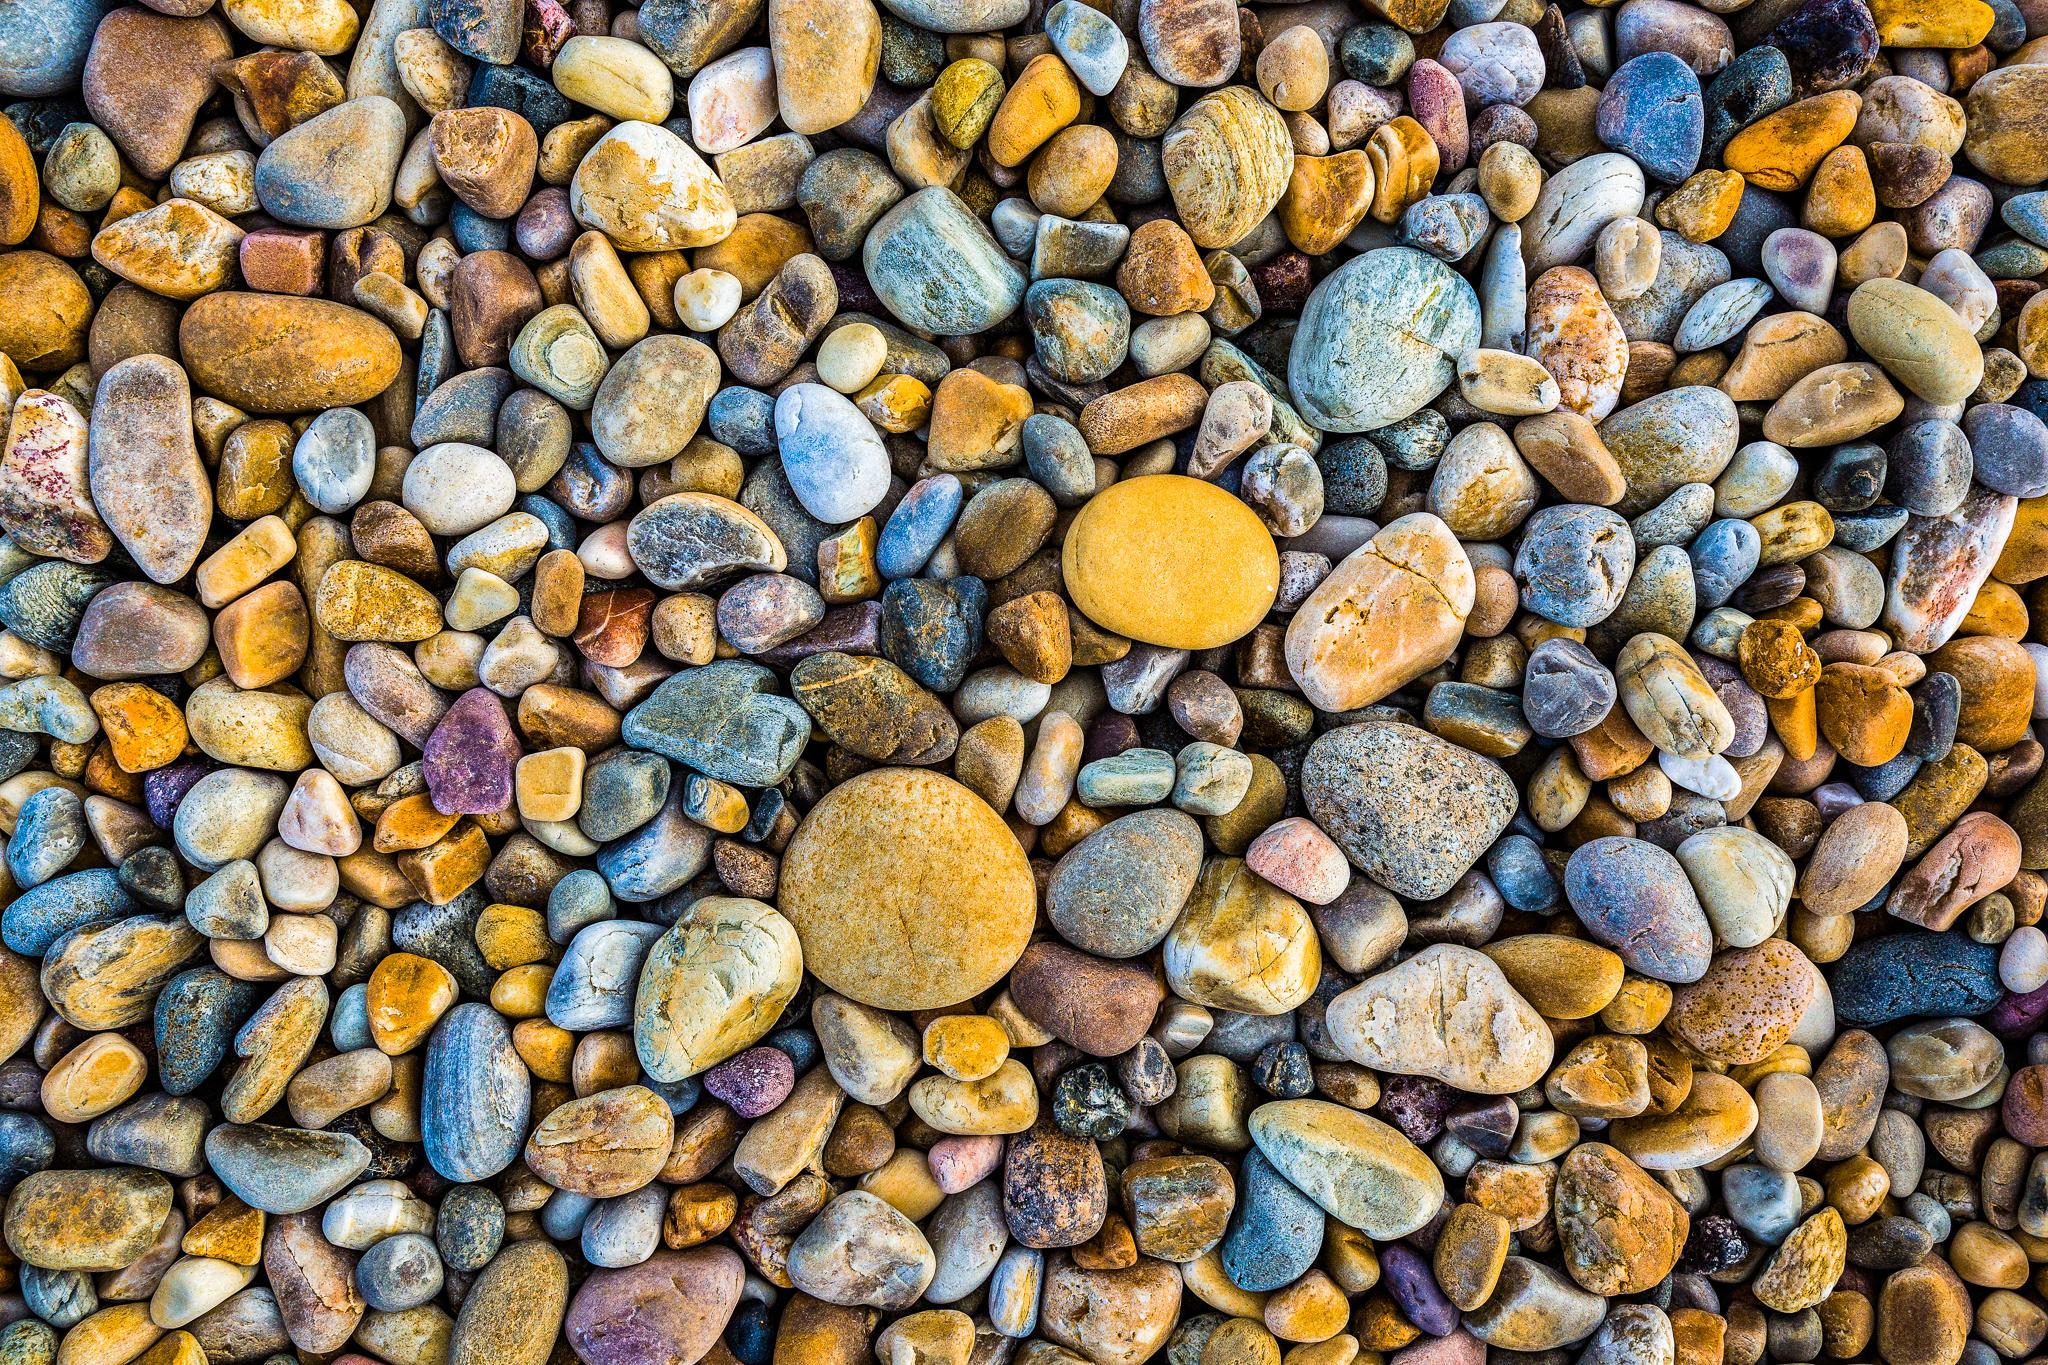 камни, щебень, галька